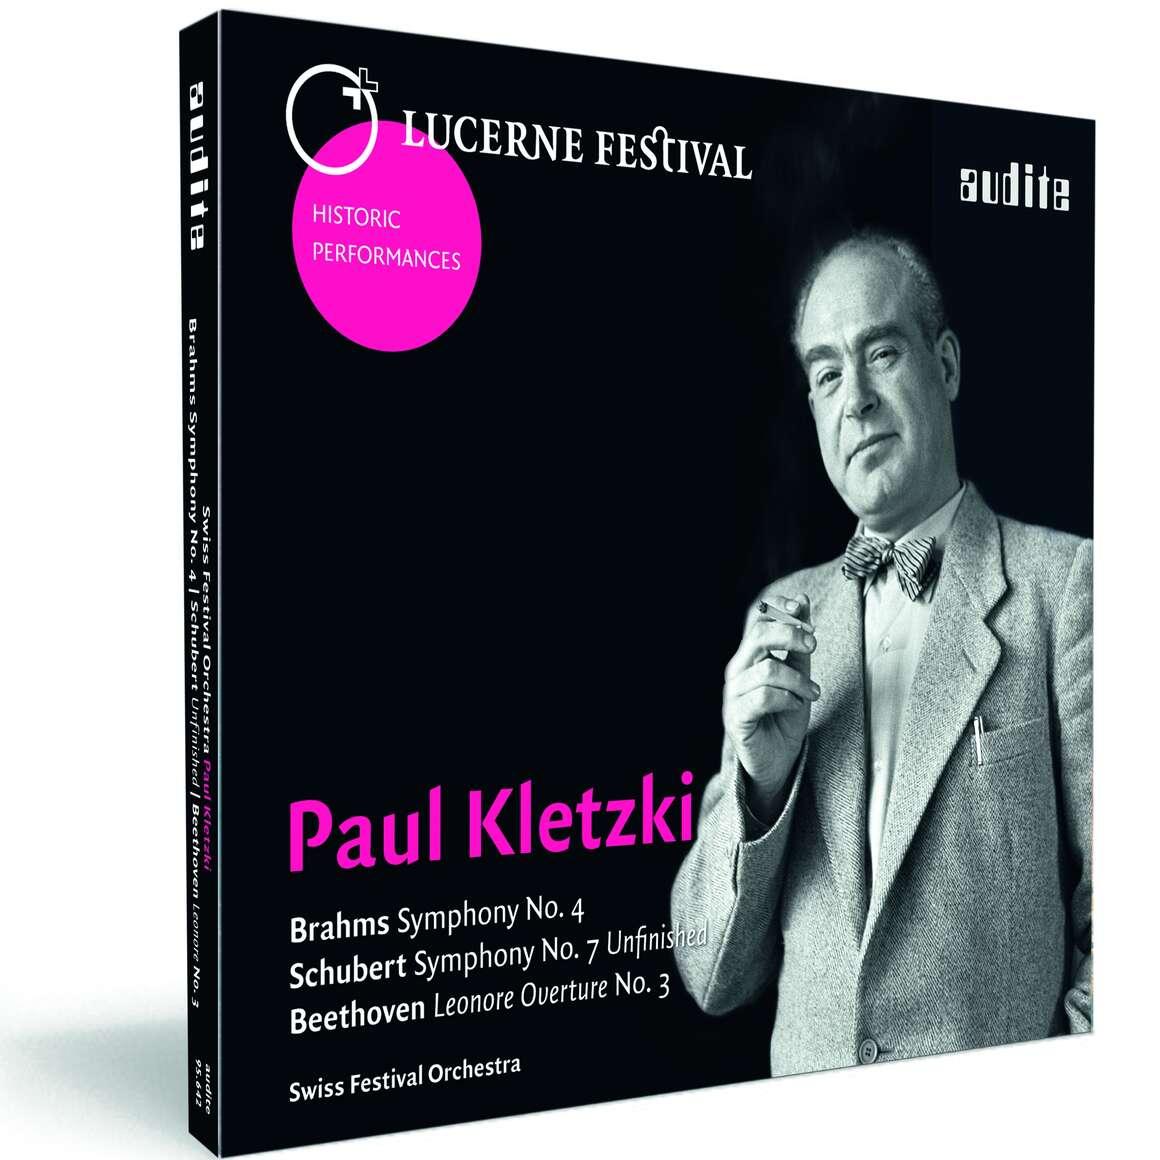 Paul Kletzki conducts Brahms, Schubert & Beethoven